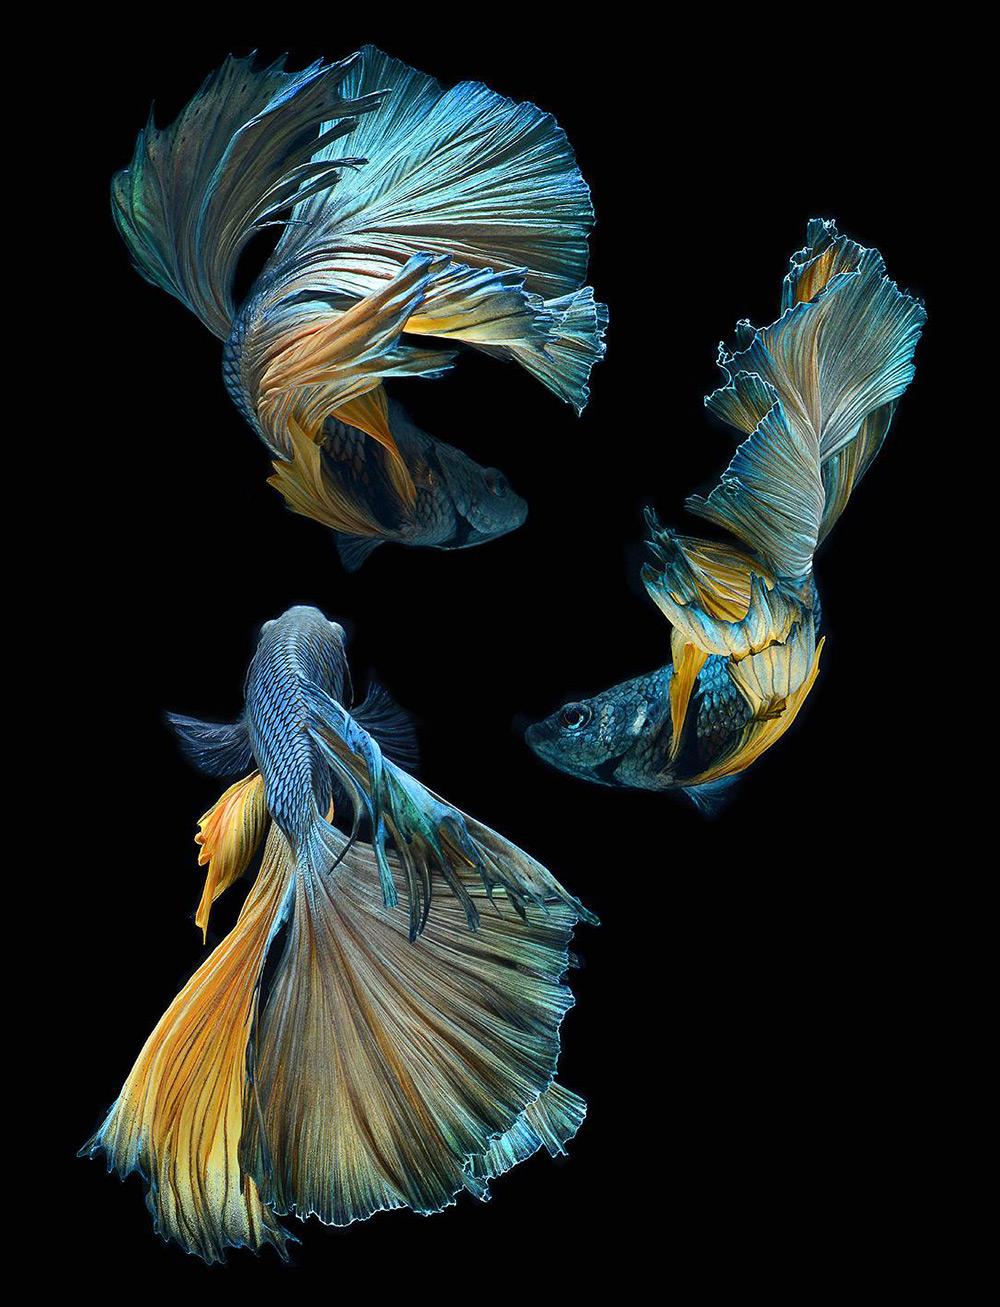 Portraits-Animals-Siamese-Fighting-Fish-Visarute-Angkatavanich-A